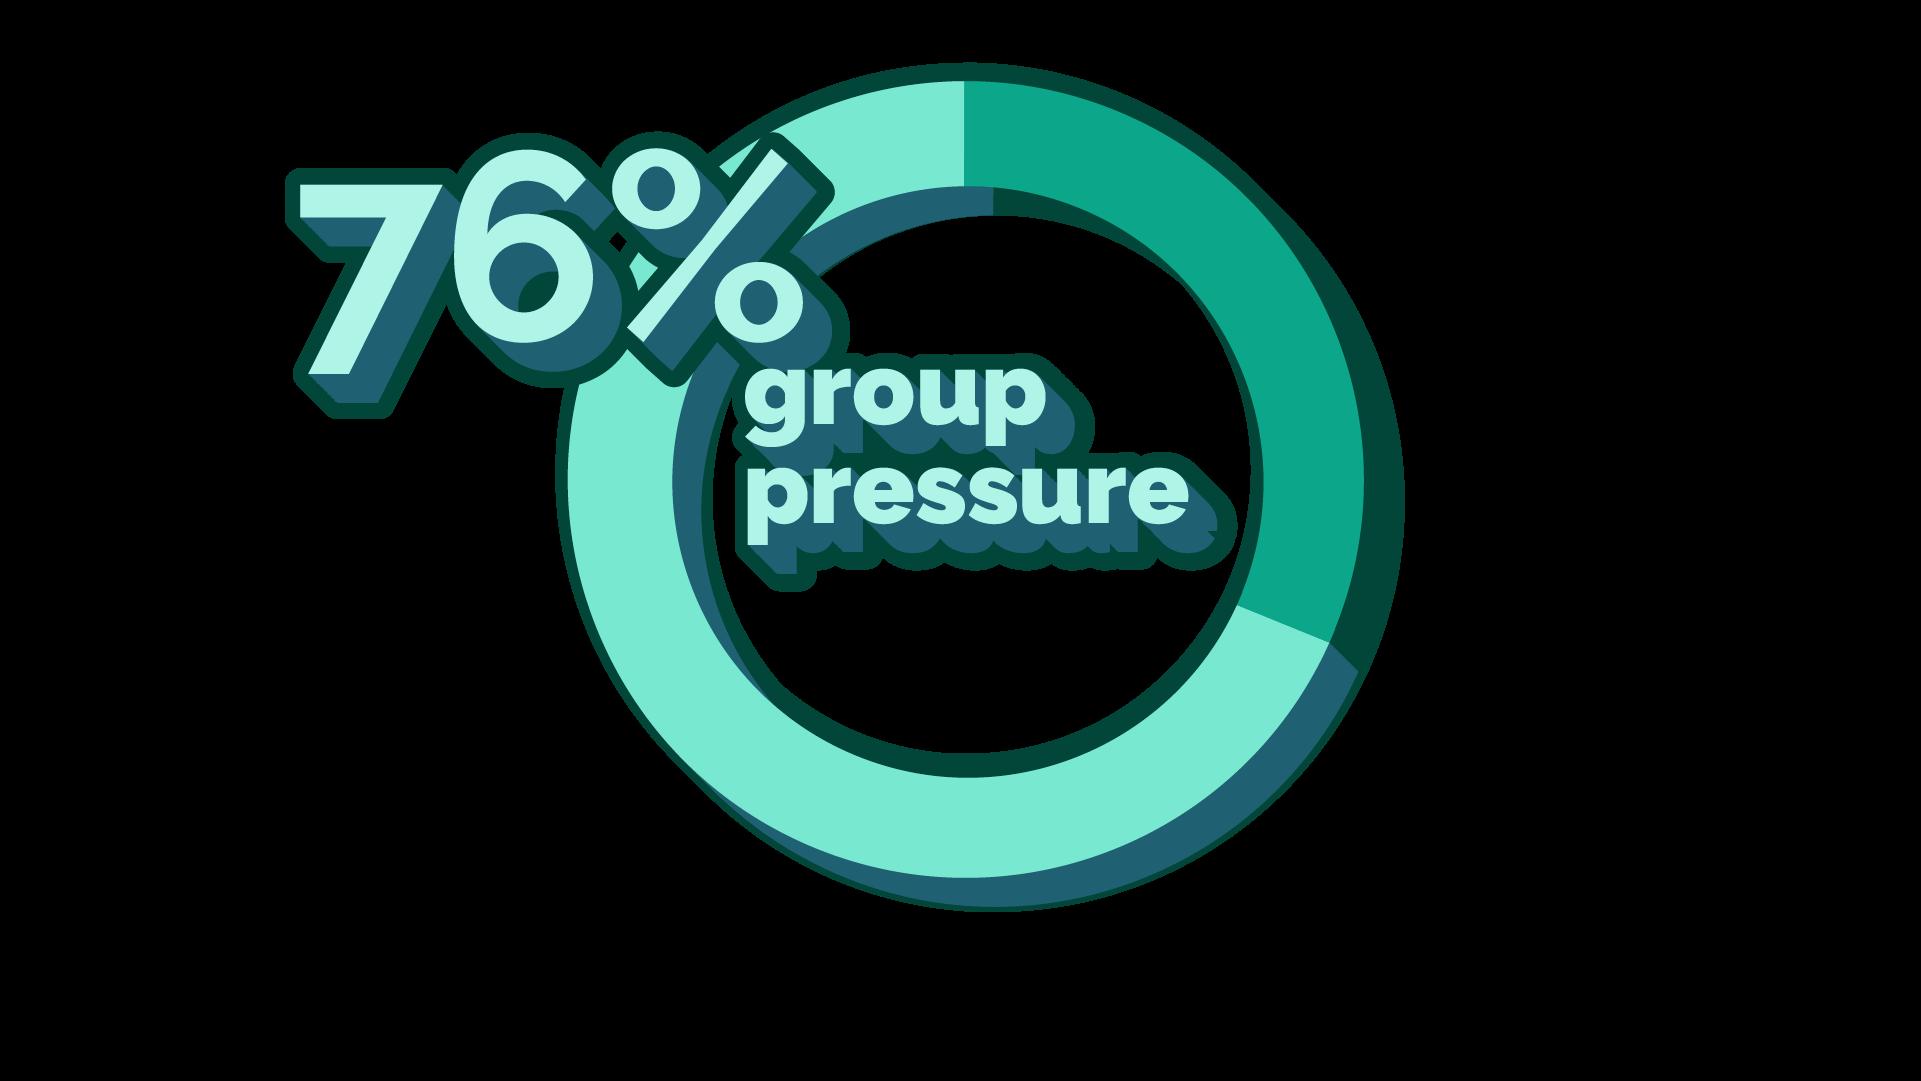 stat: 76% 'group pressure'